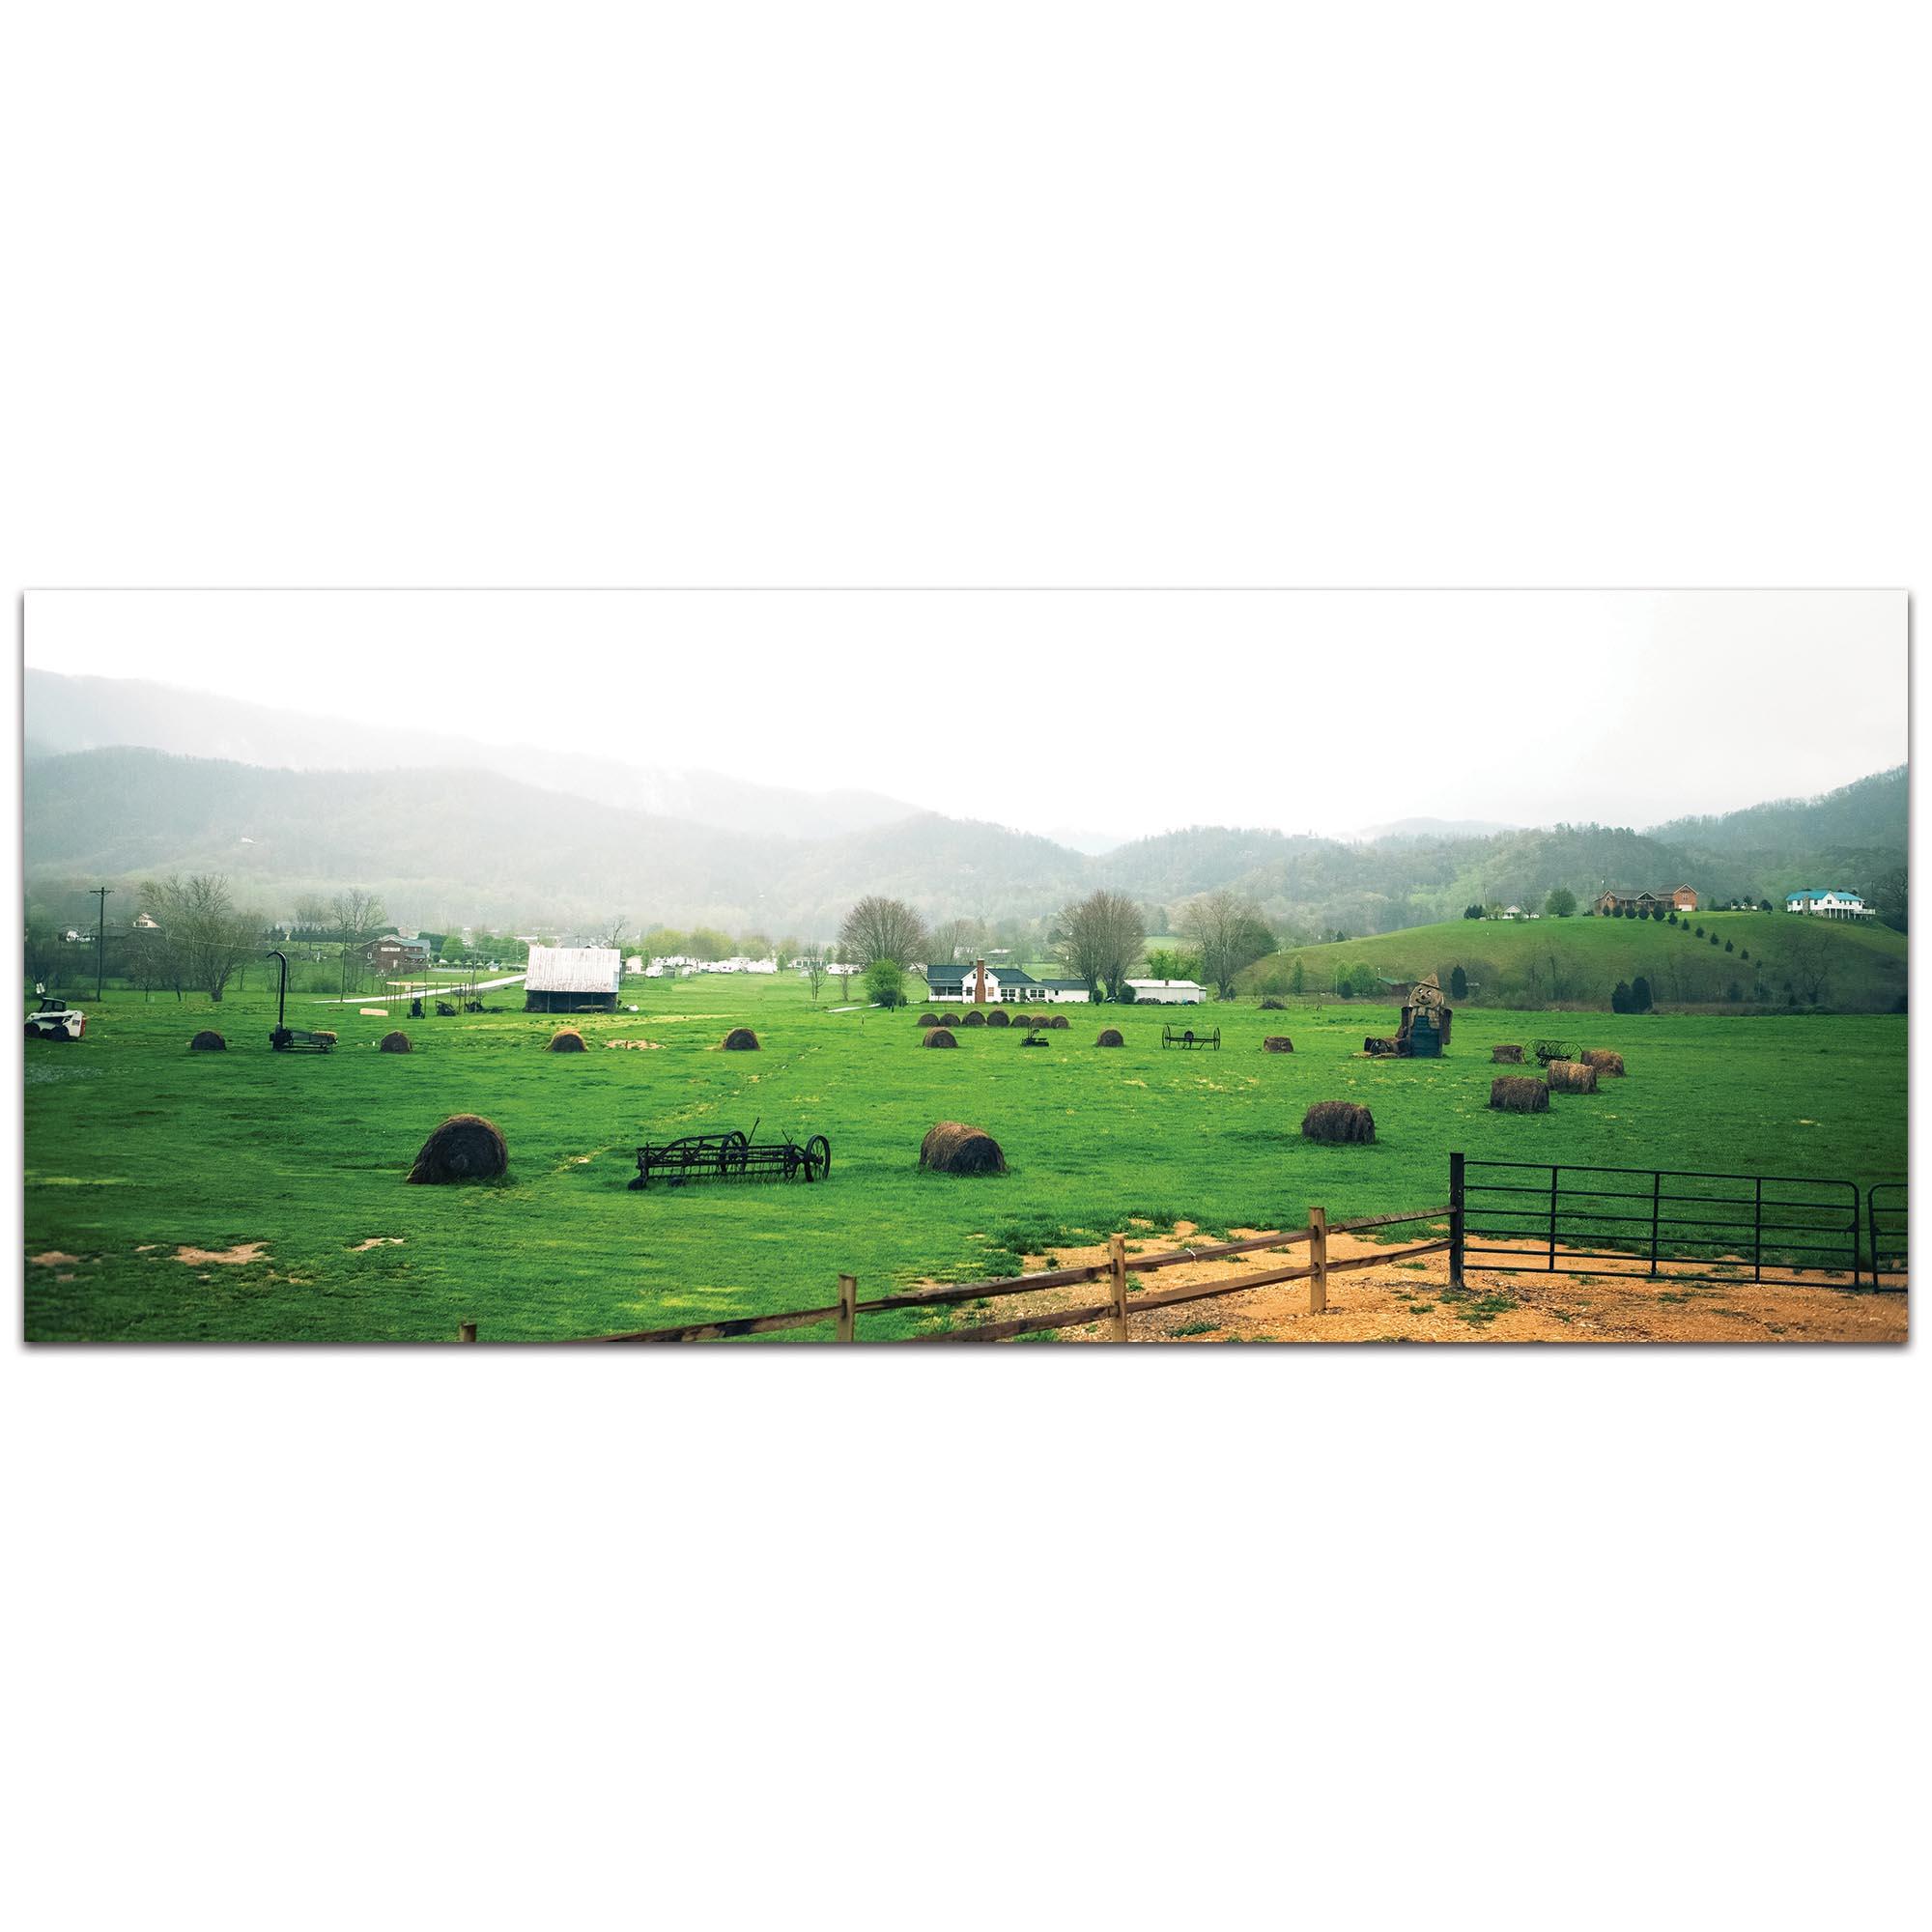 Western Wall Art 'Farming Town' - Farm Landscape Decor on Metal or Plexiglass